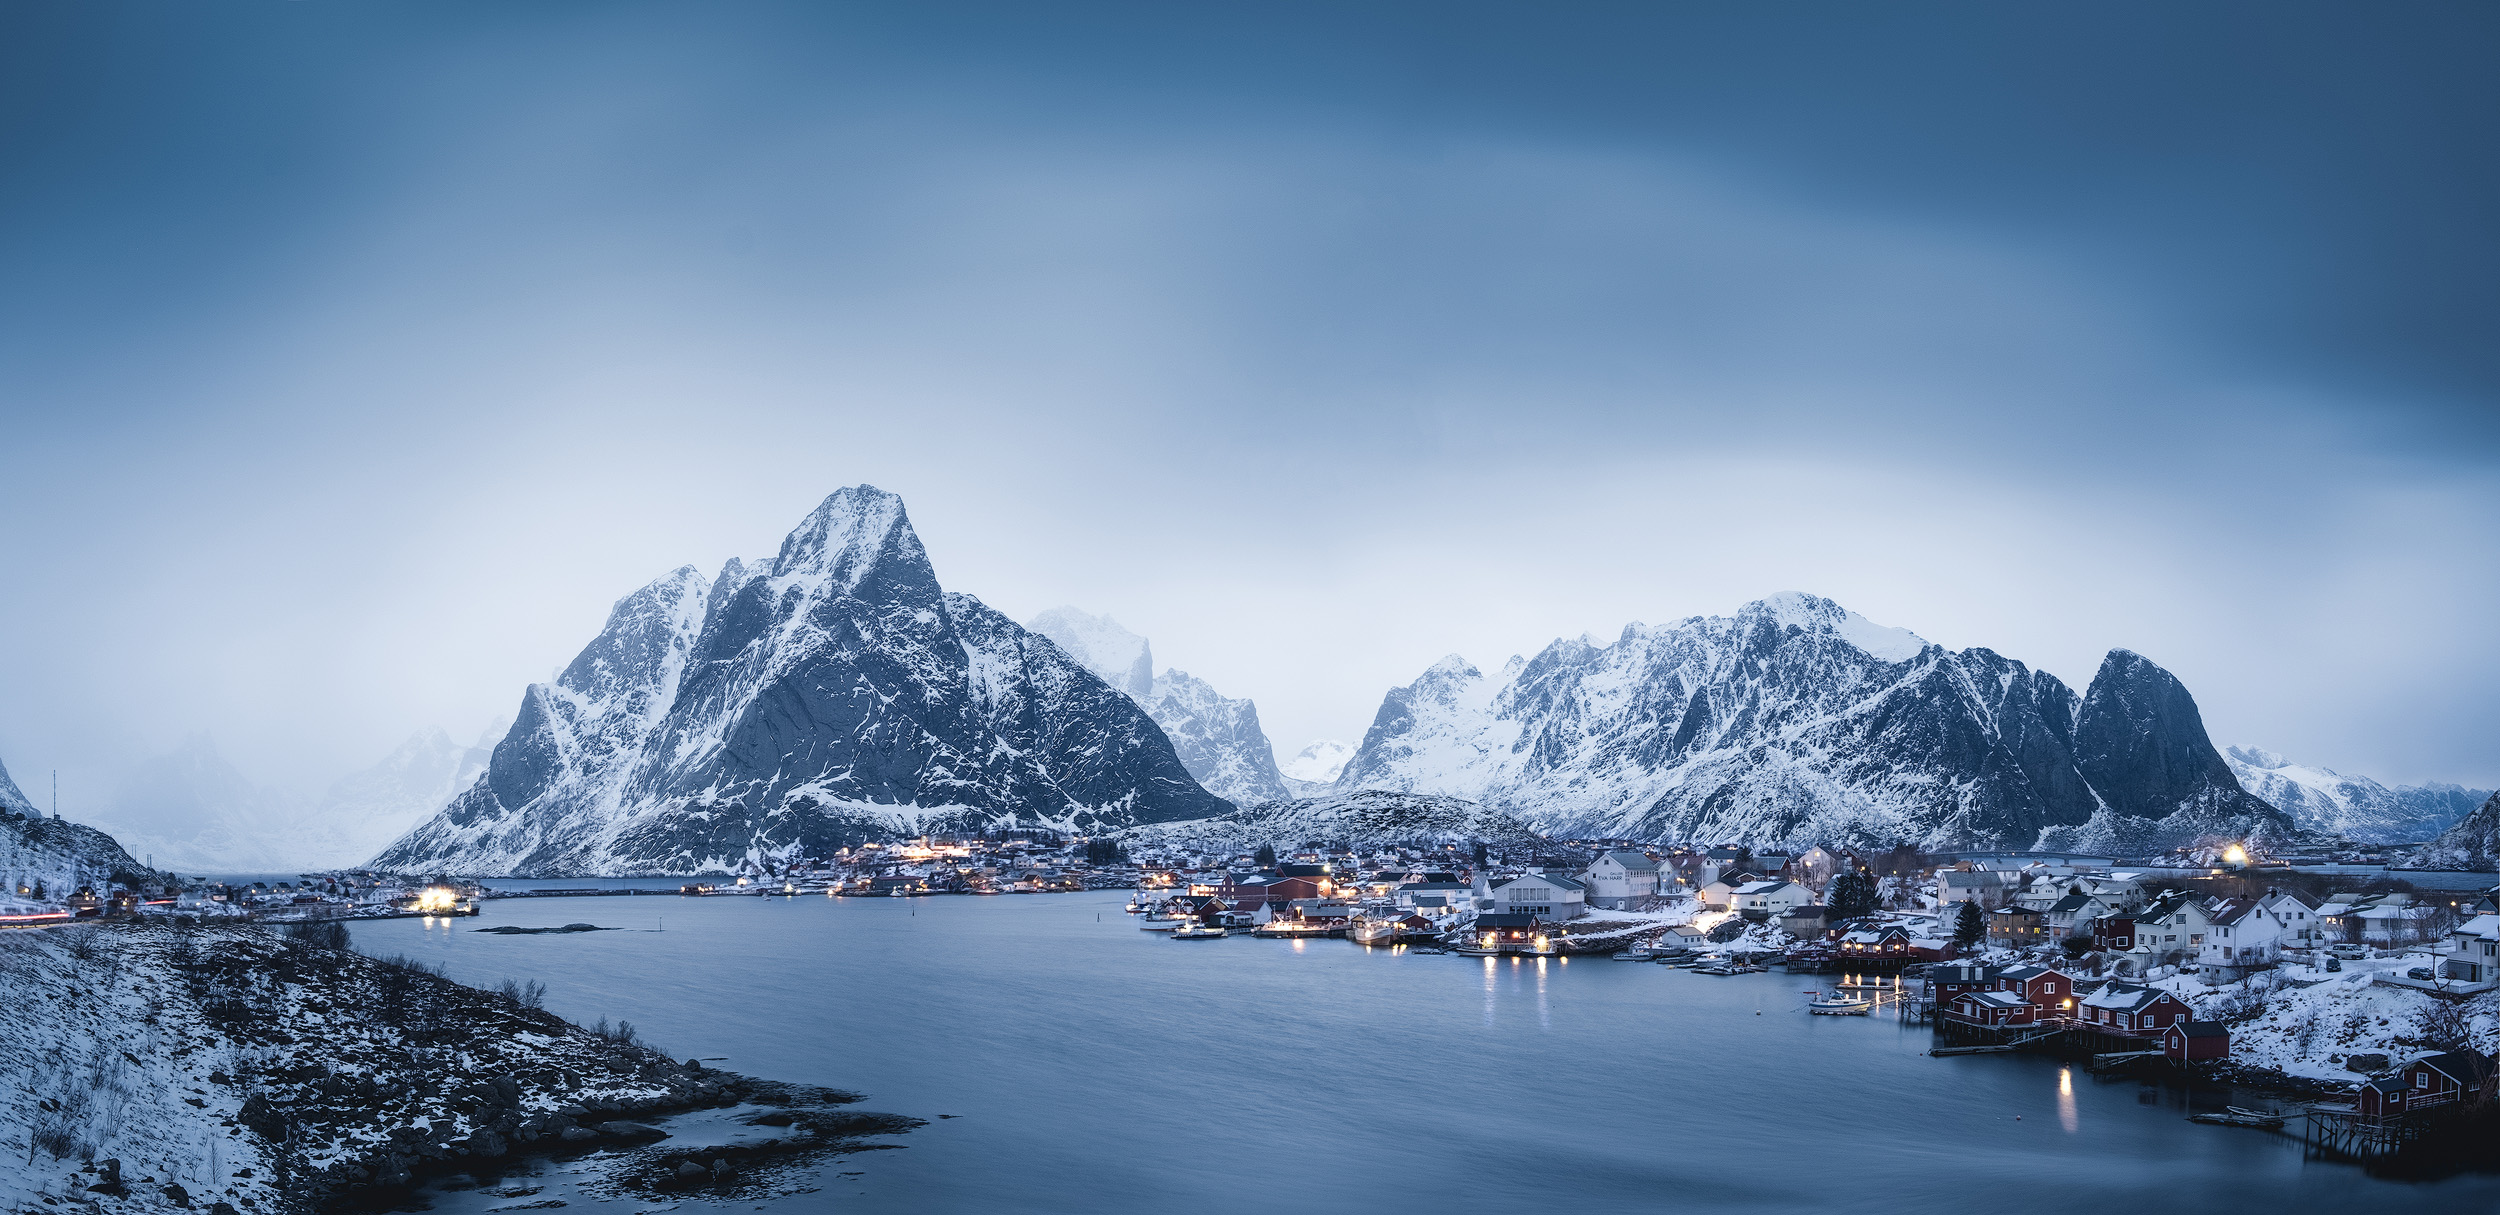 Reine Harbour   The harbour at Reine in Norway's Lofoten Islands in a blue hour snow storm,